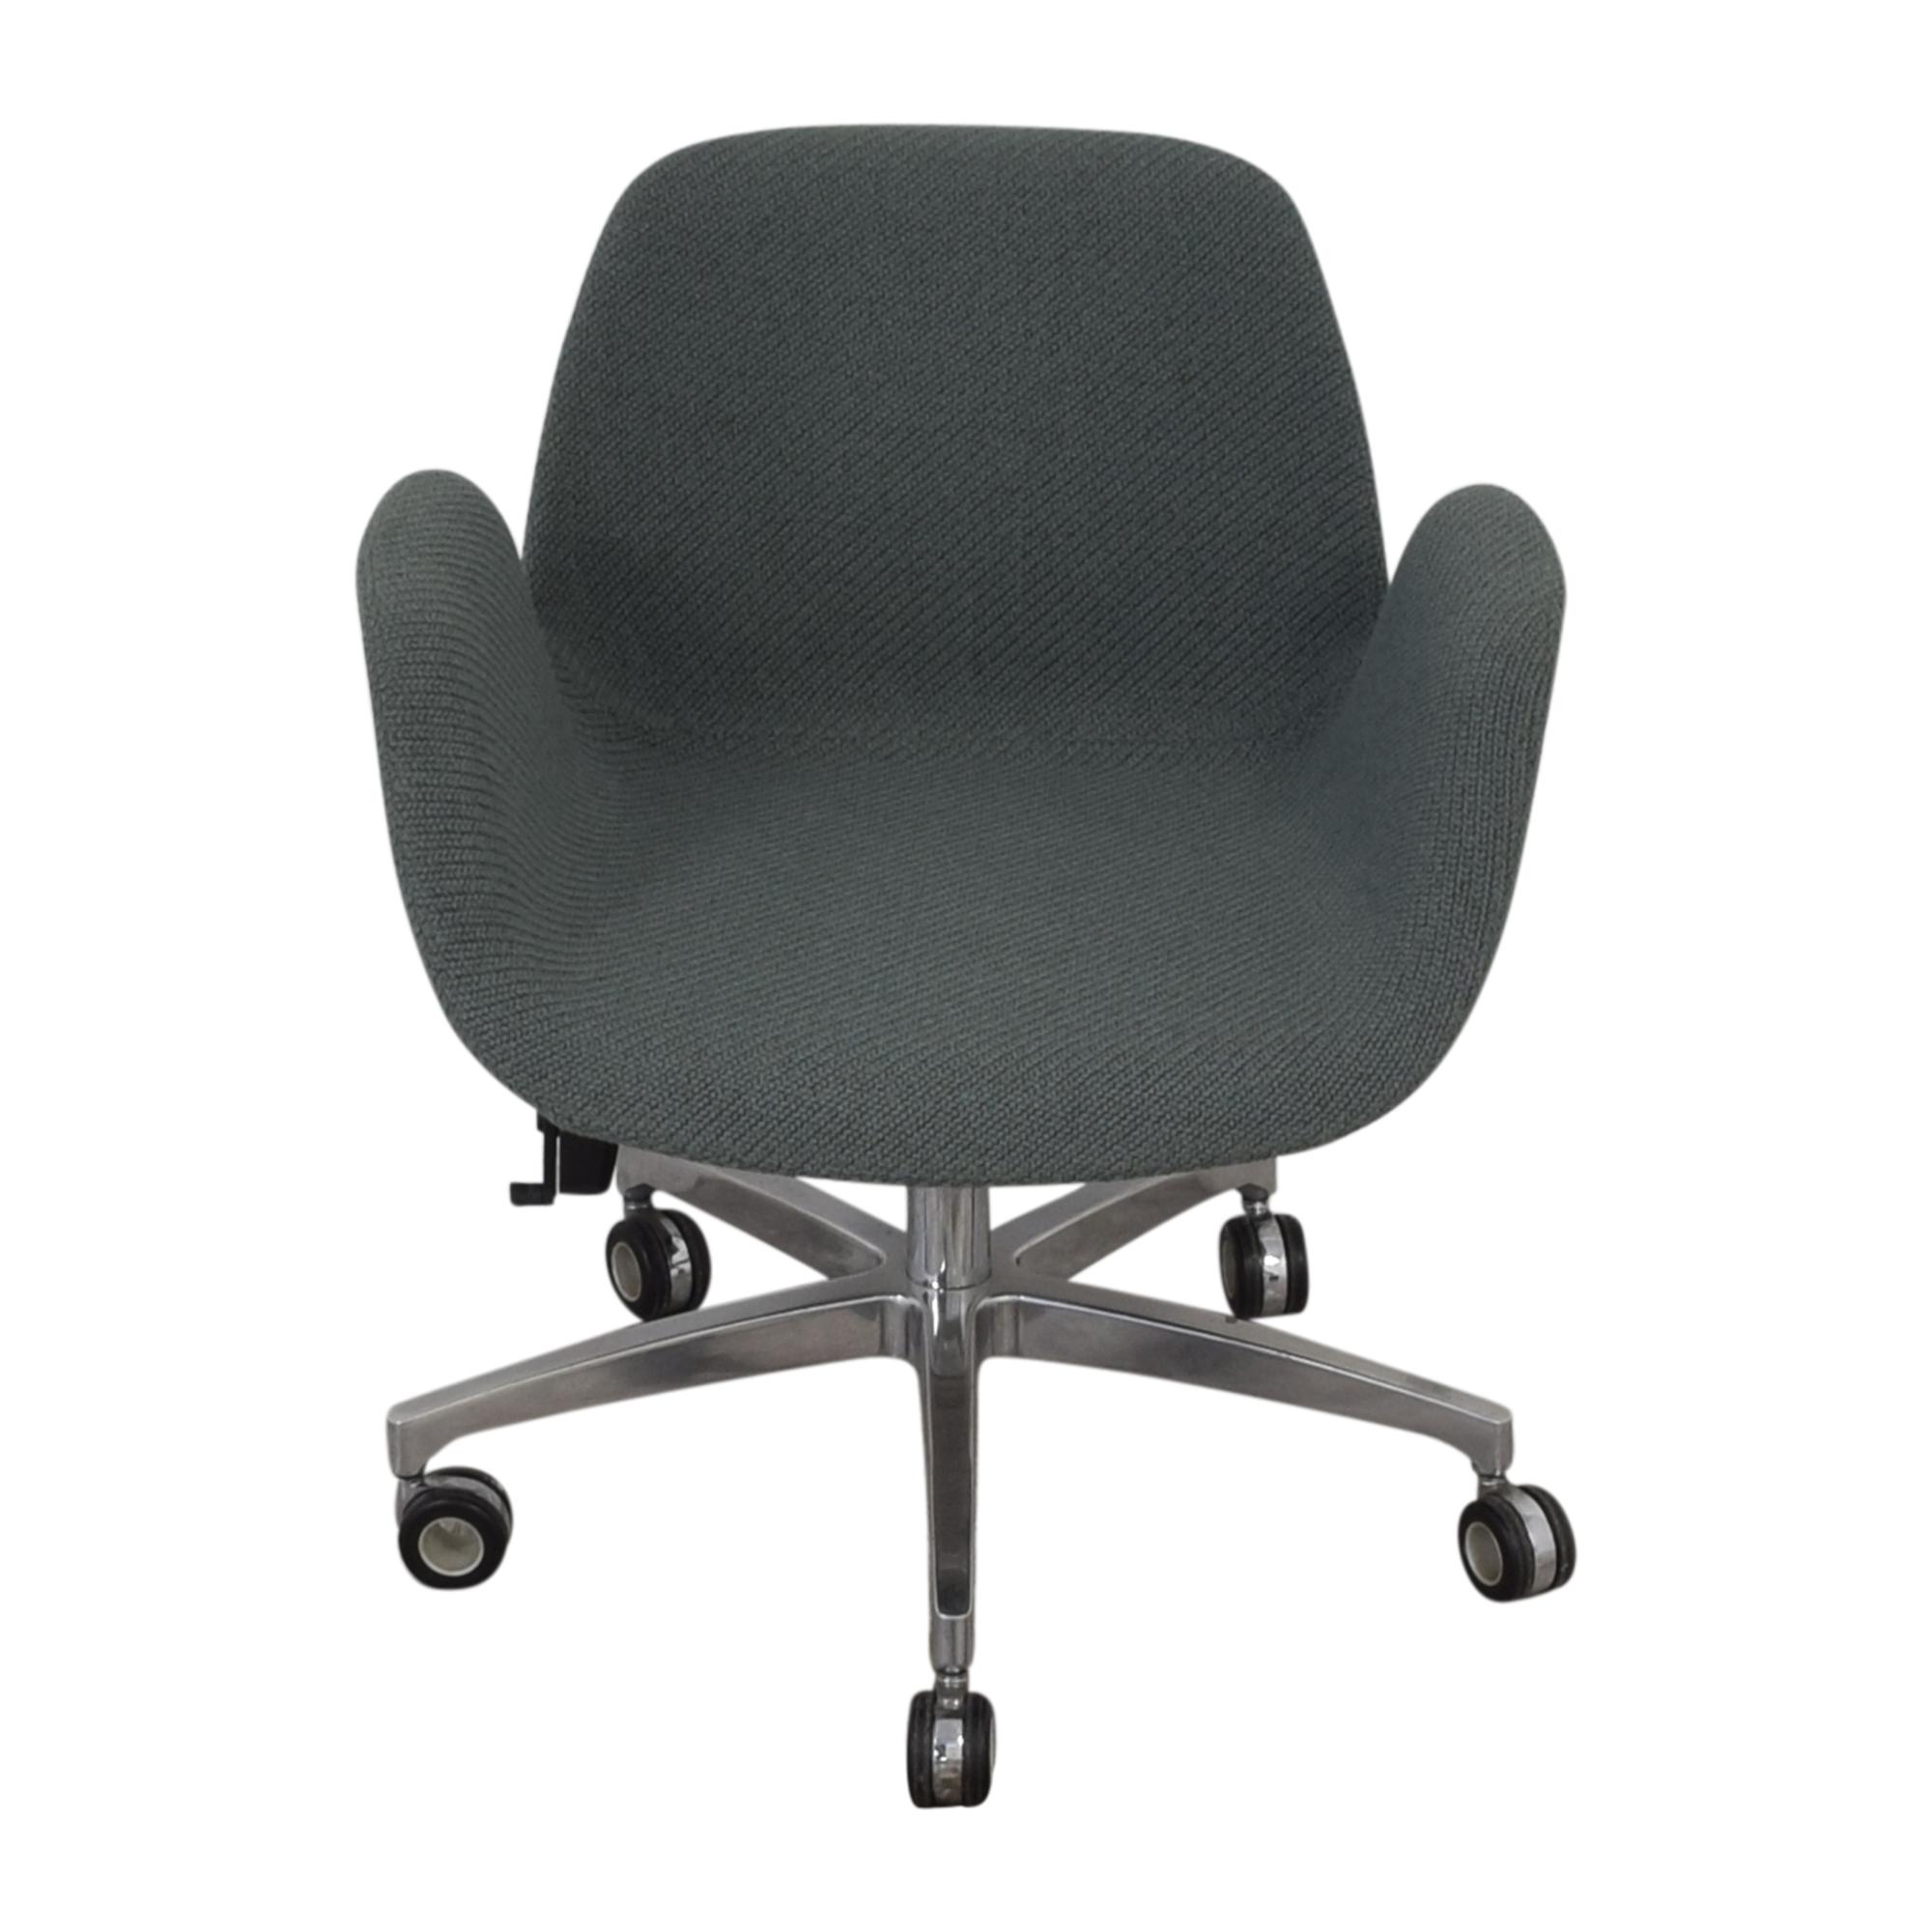 Koleksiyon Koleksiyon Halia Operator Task Chair discount